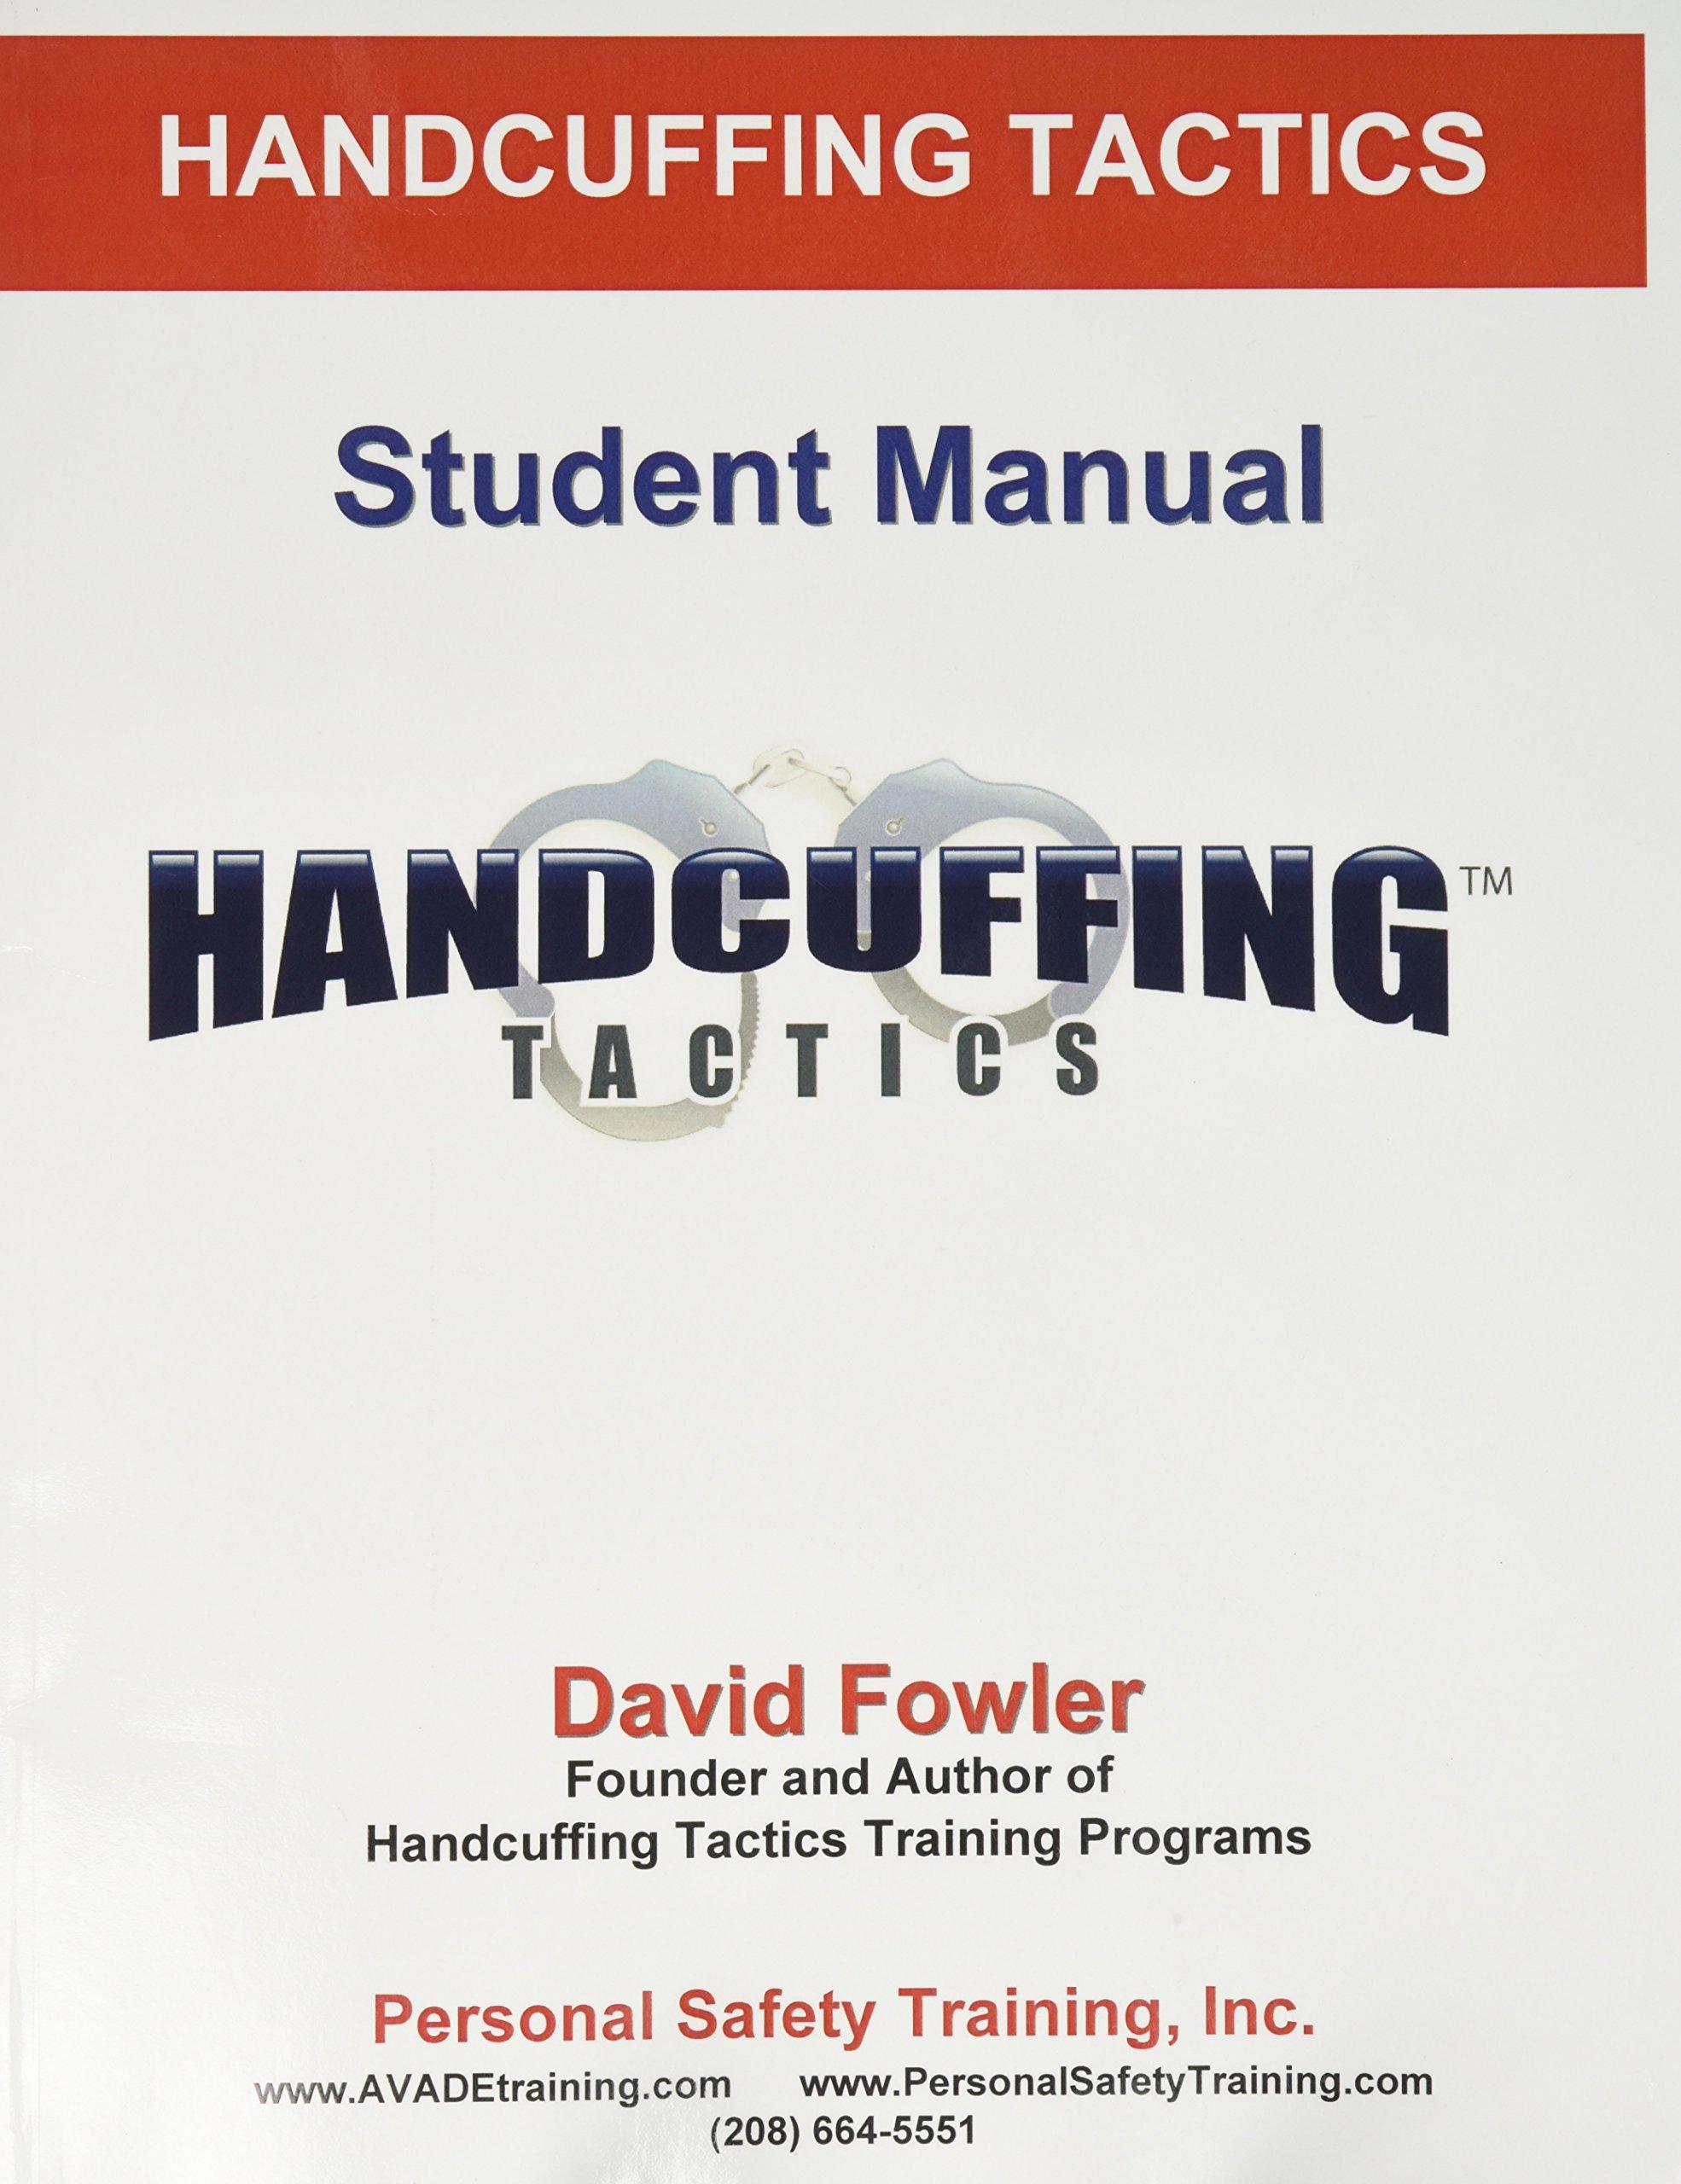 Amazon.in: Buy Handcuffing Tactics Book Online at Low Prices in India |  Handcuffing Tactics Reviews & Ratings